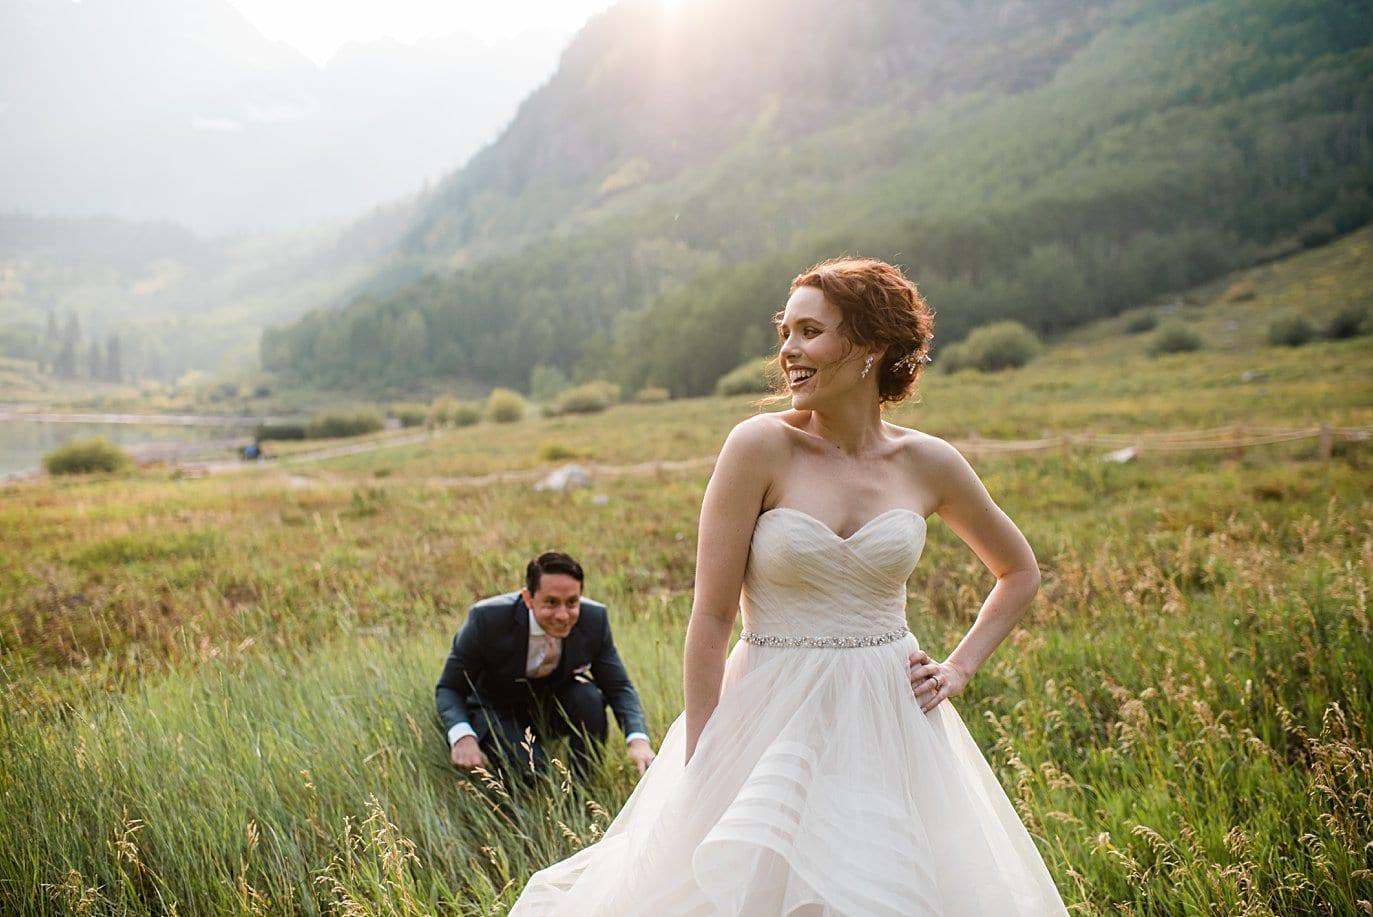 fun at fall Maroon Bells wedding by Aspen wedding photographer Jennie Crate